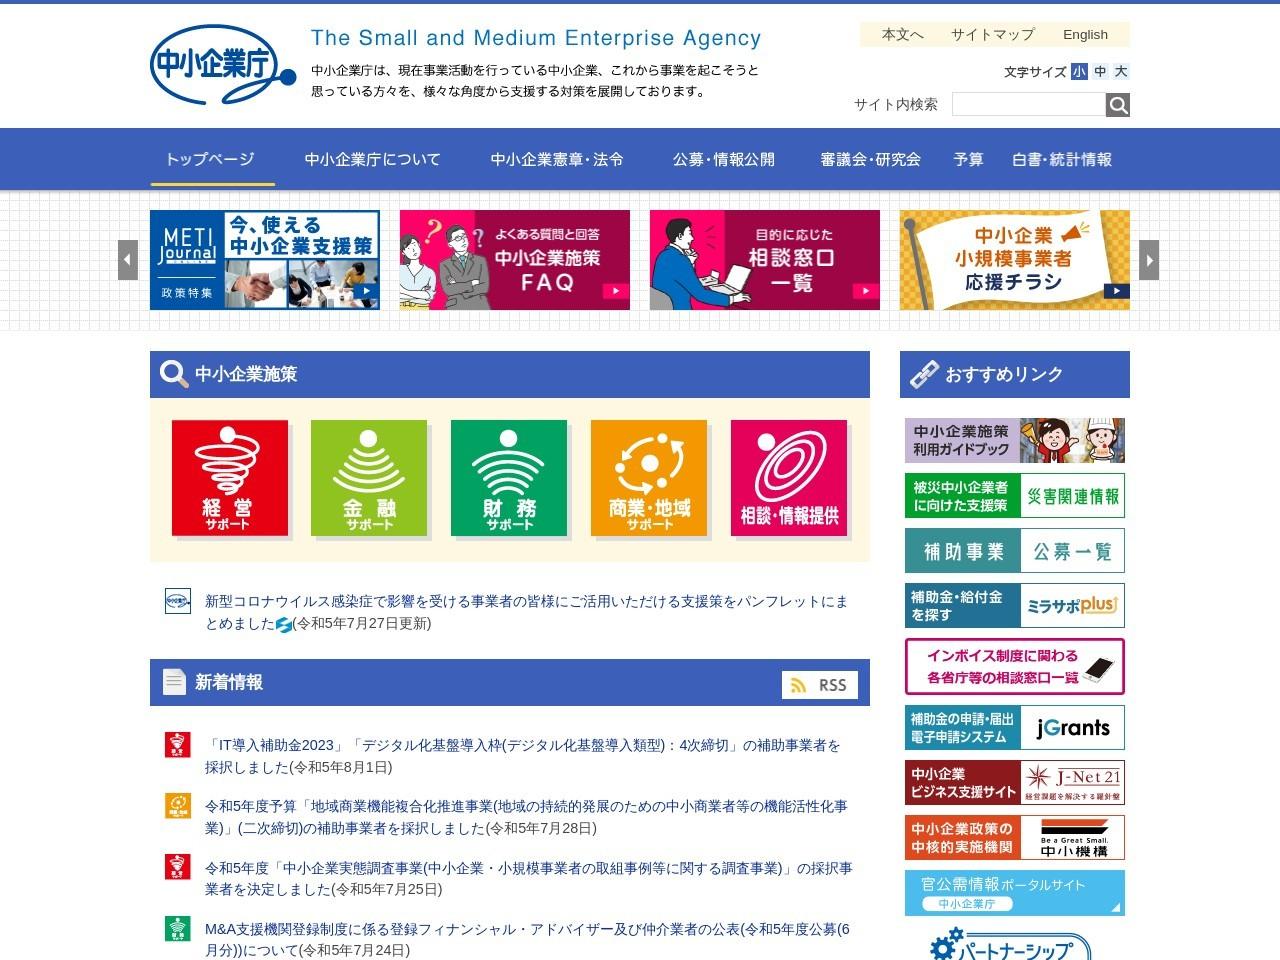 https://www.chusho.meti.go.jp/koukai/chousa/chushoKigyouZentai9wari.pdf